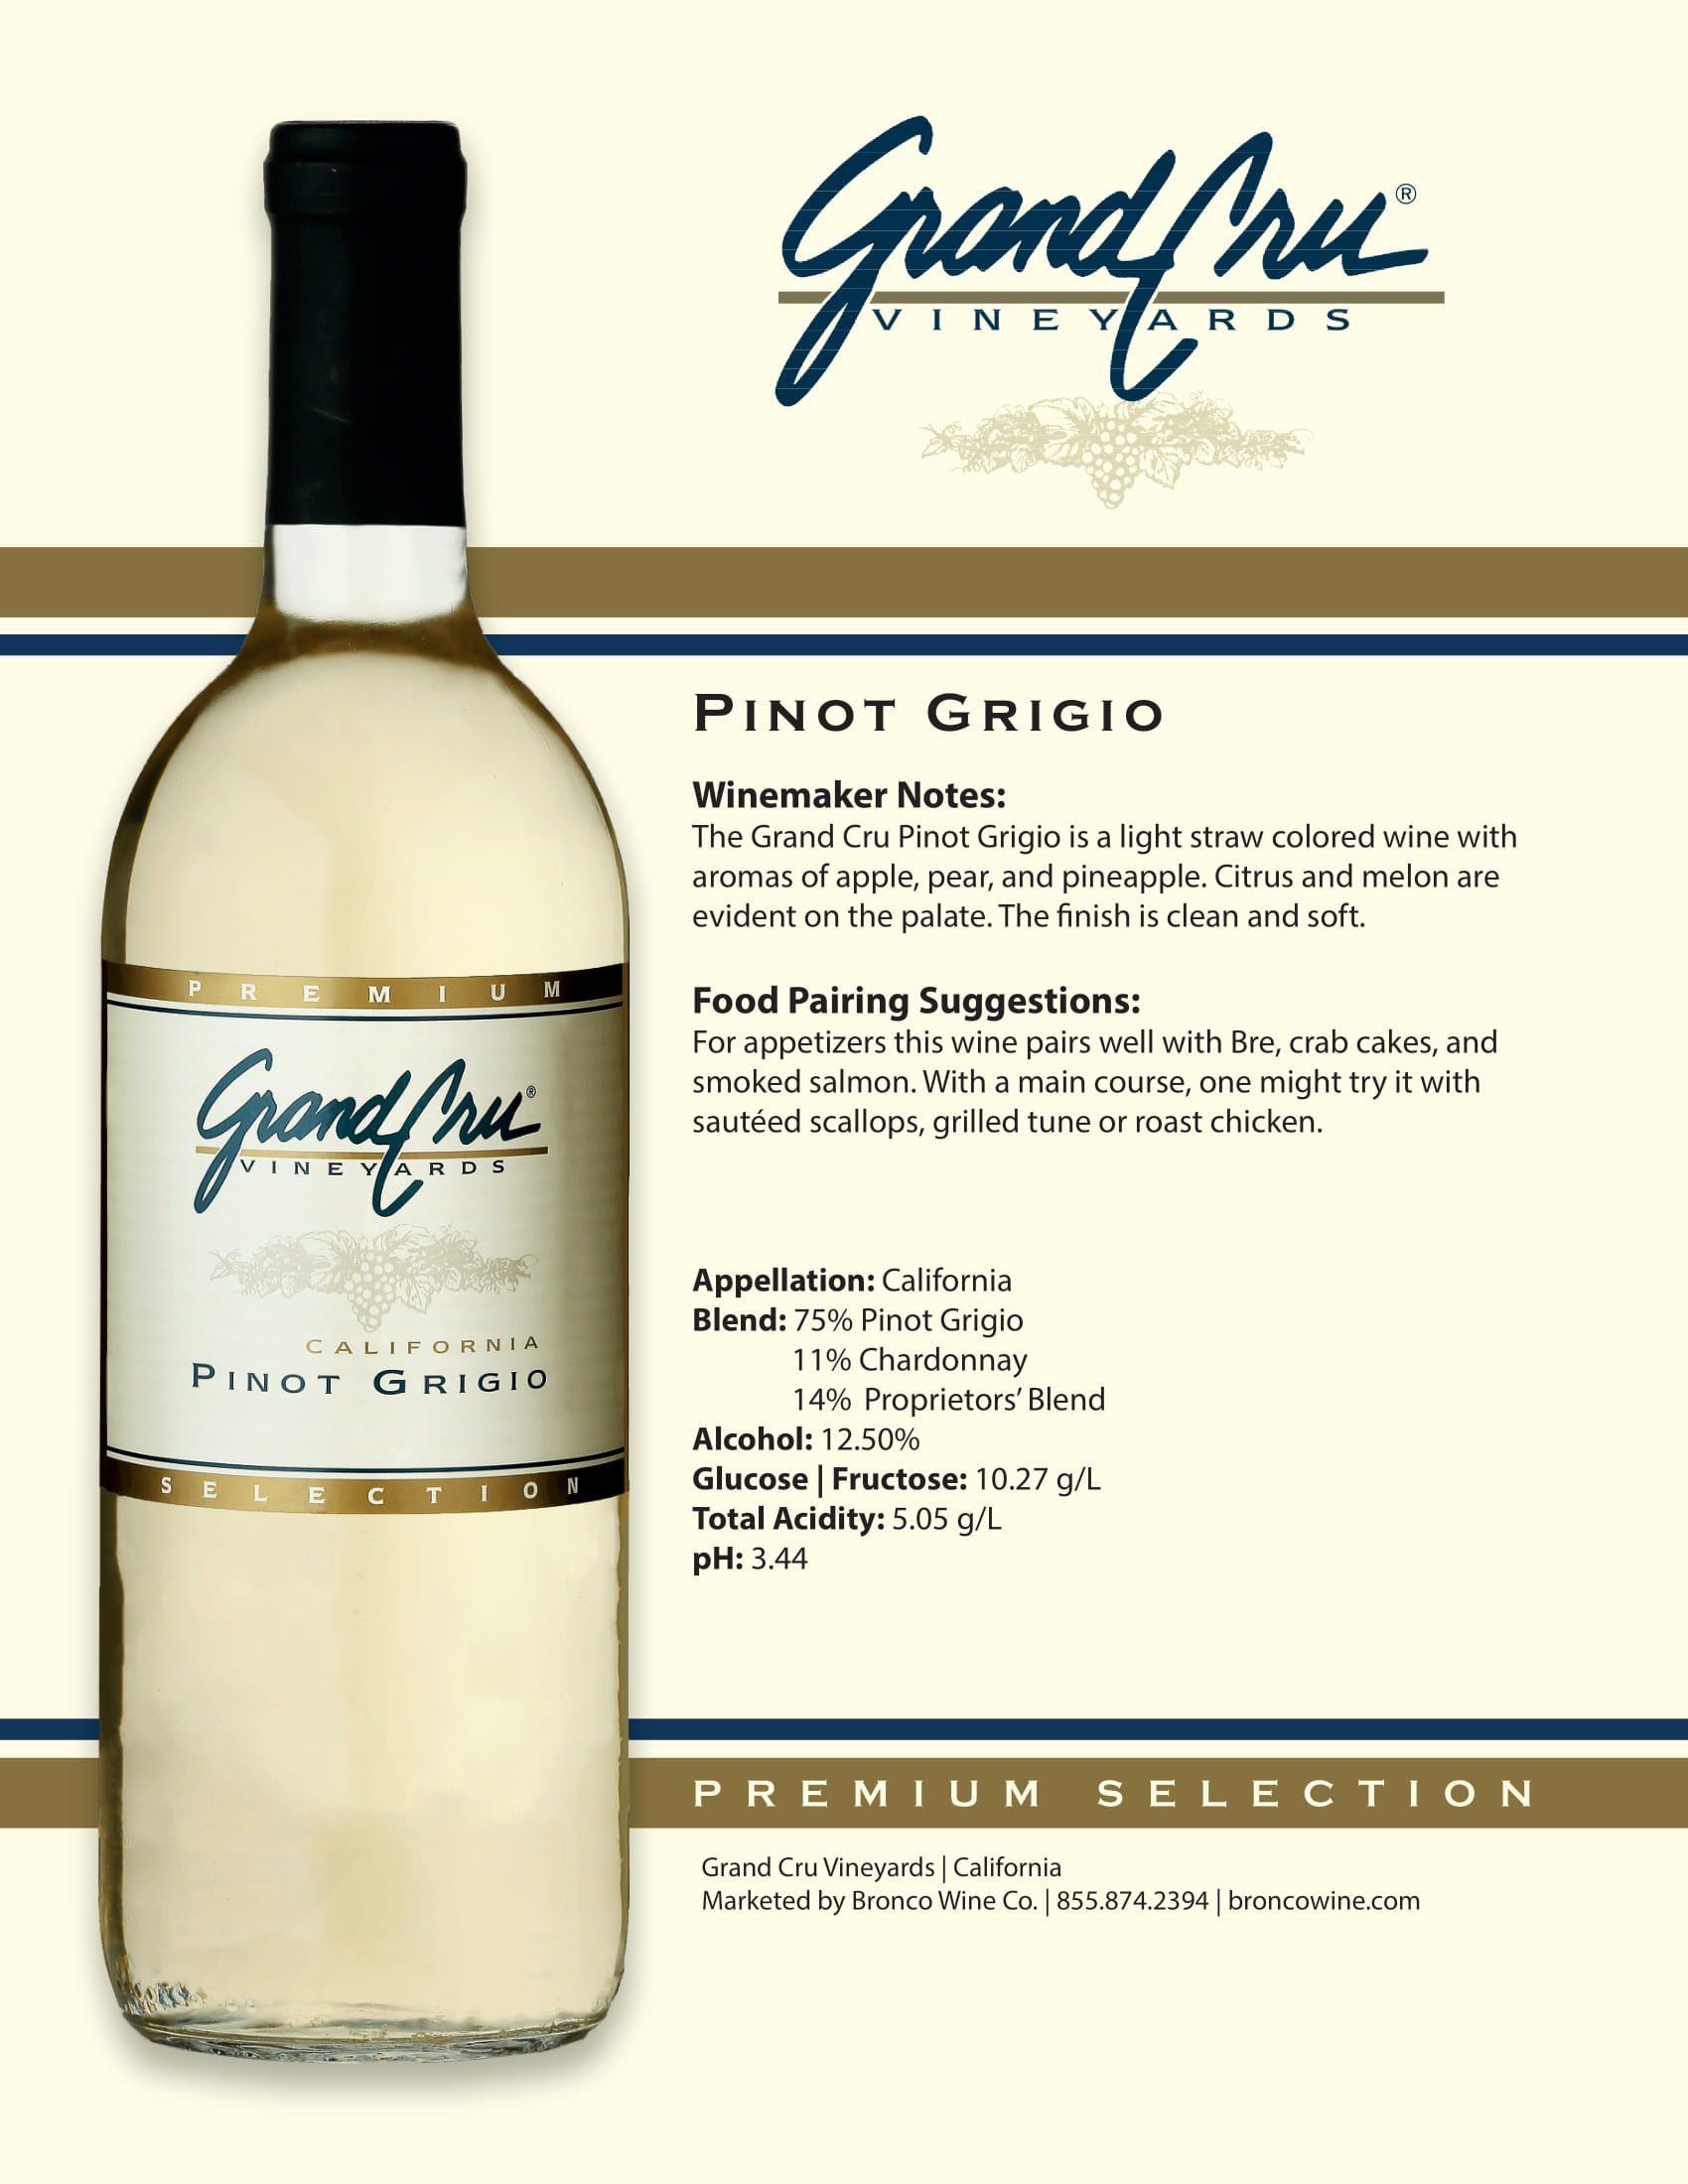 Grand Cru Pinot Grigio Tech Sheet